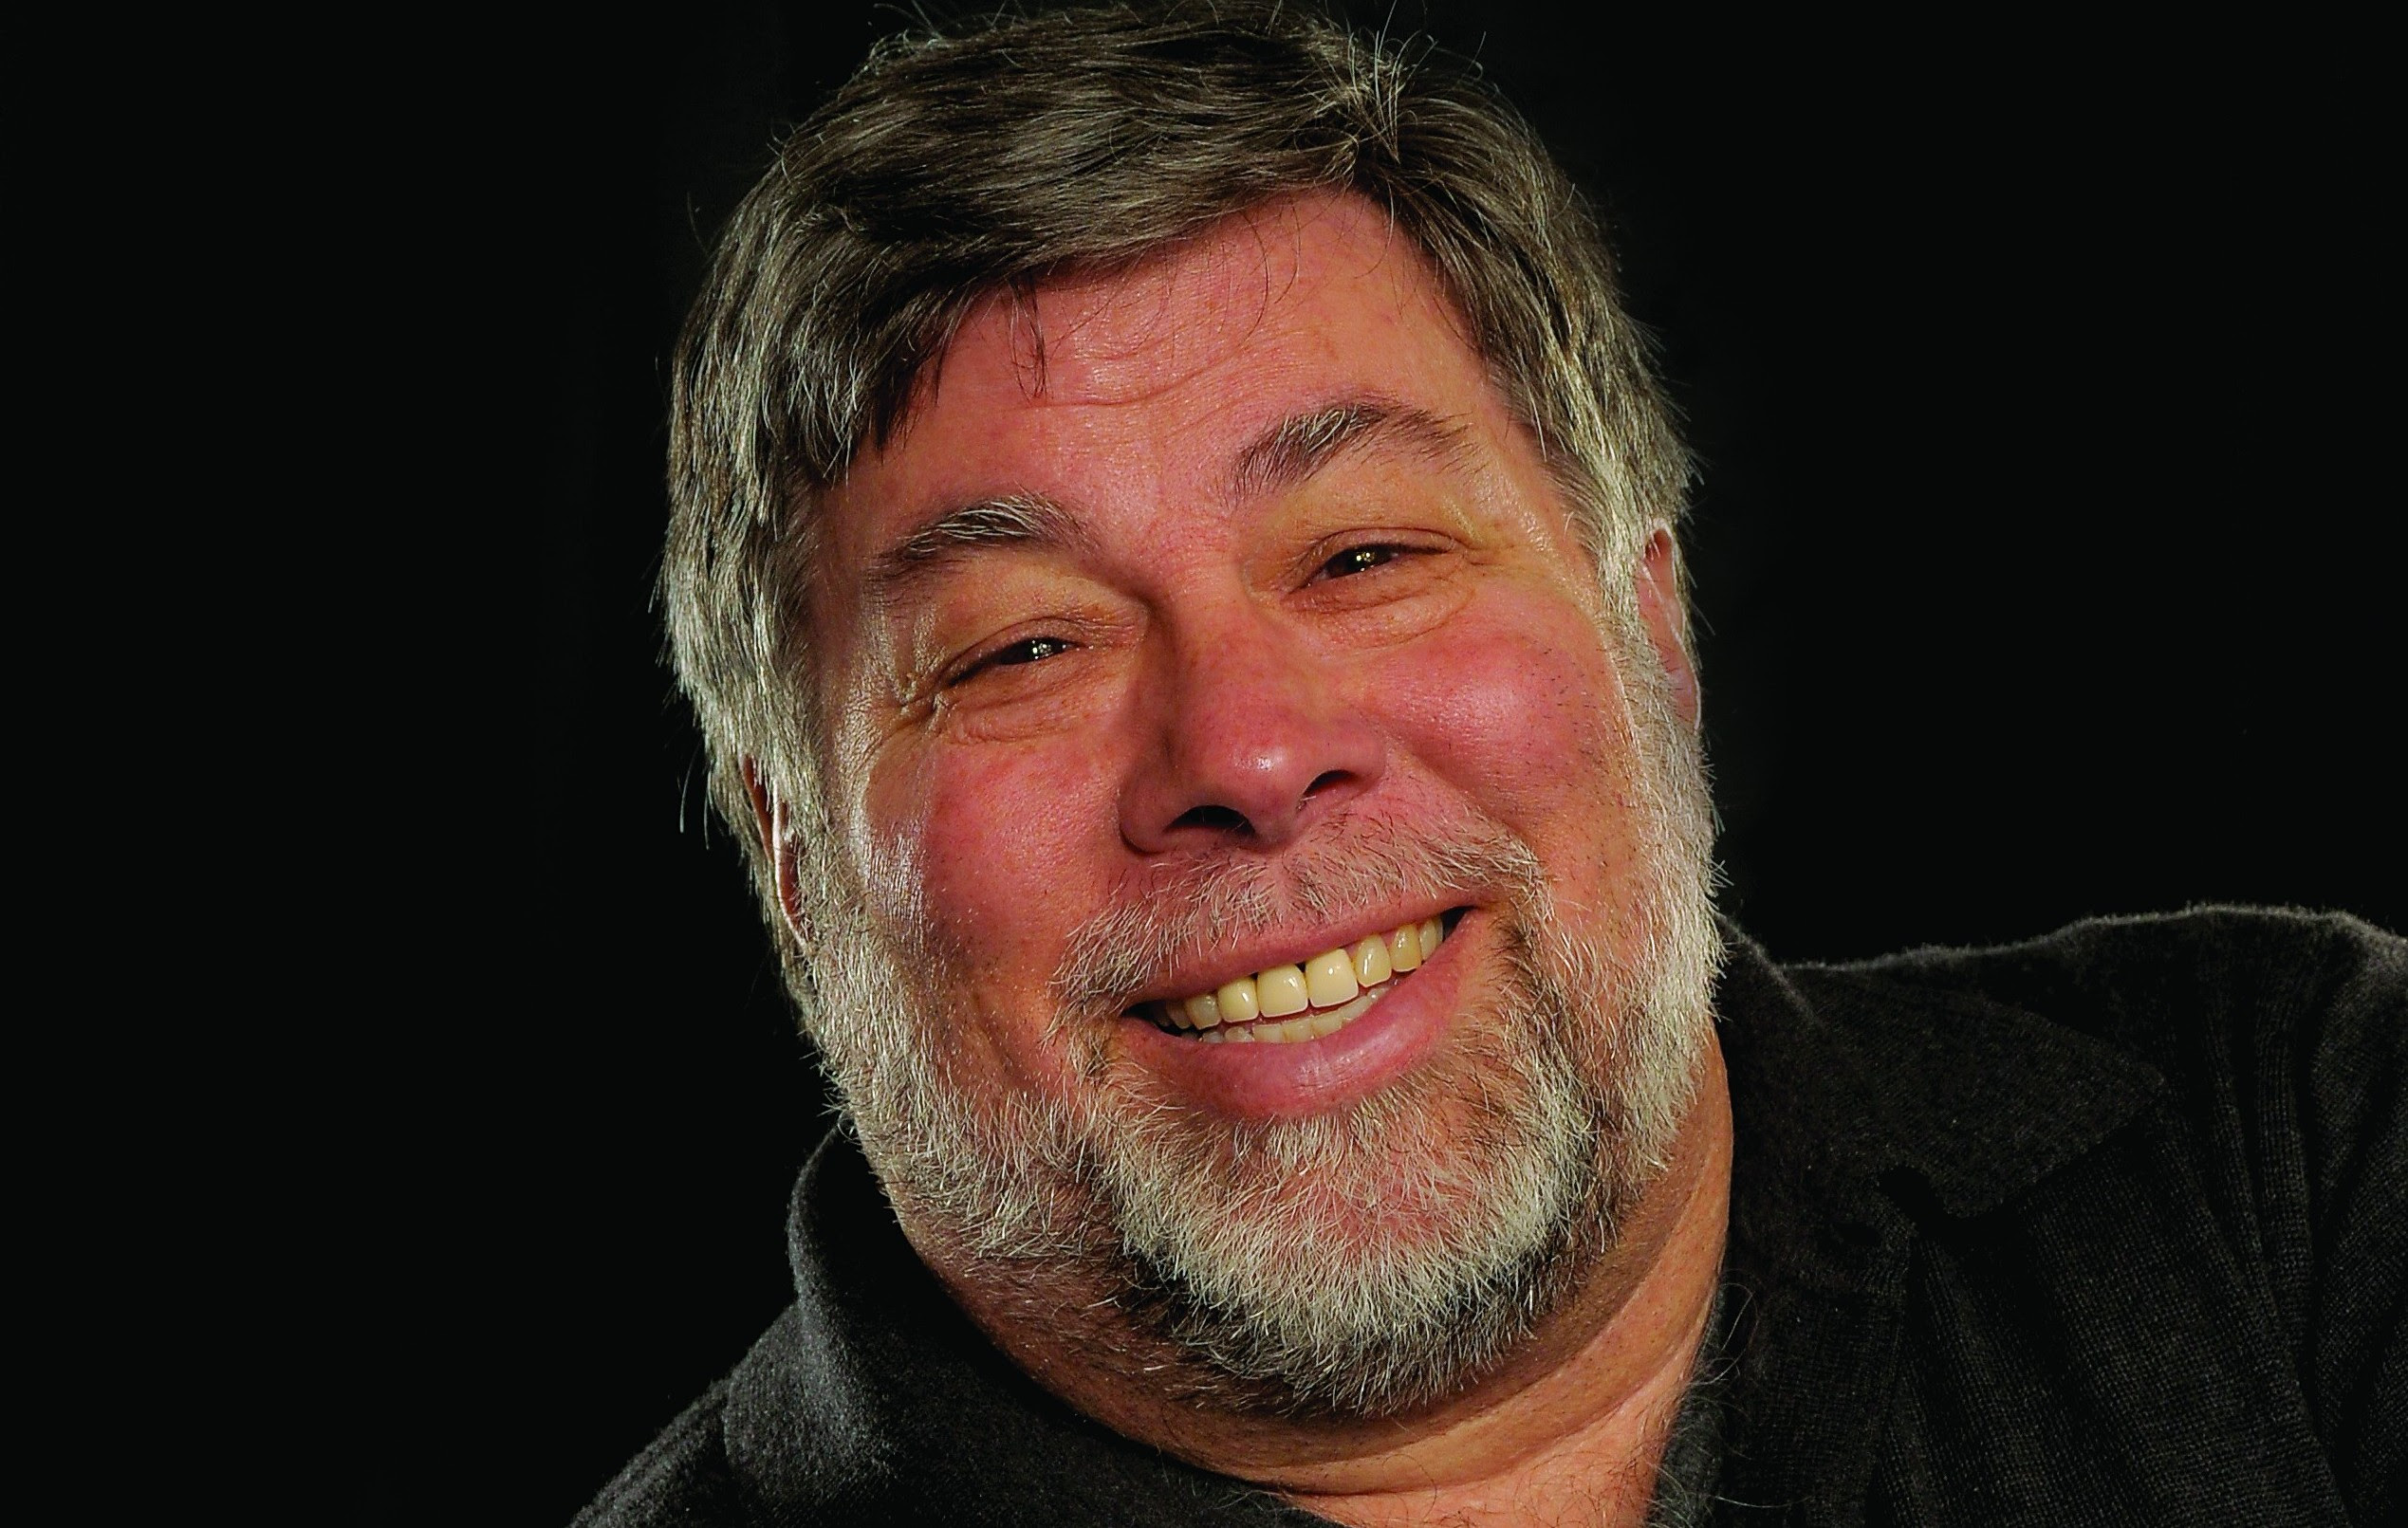 est100 一些攝影(some photos): Steve Wozniak, 沃茲尼克